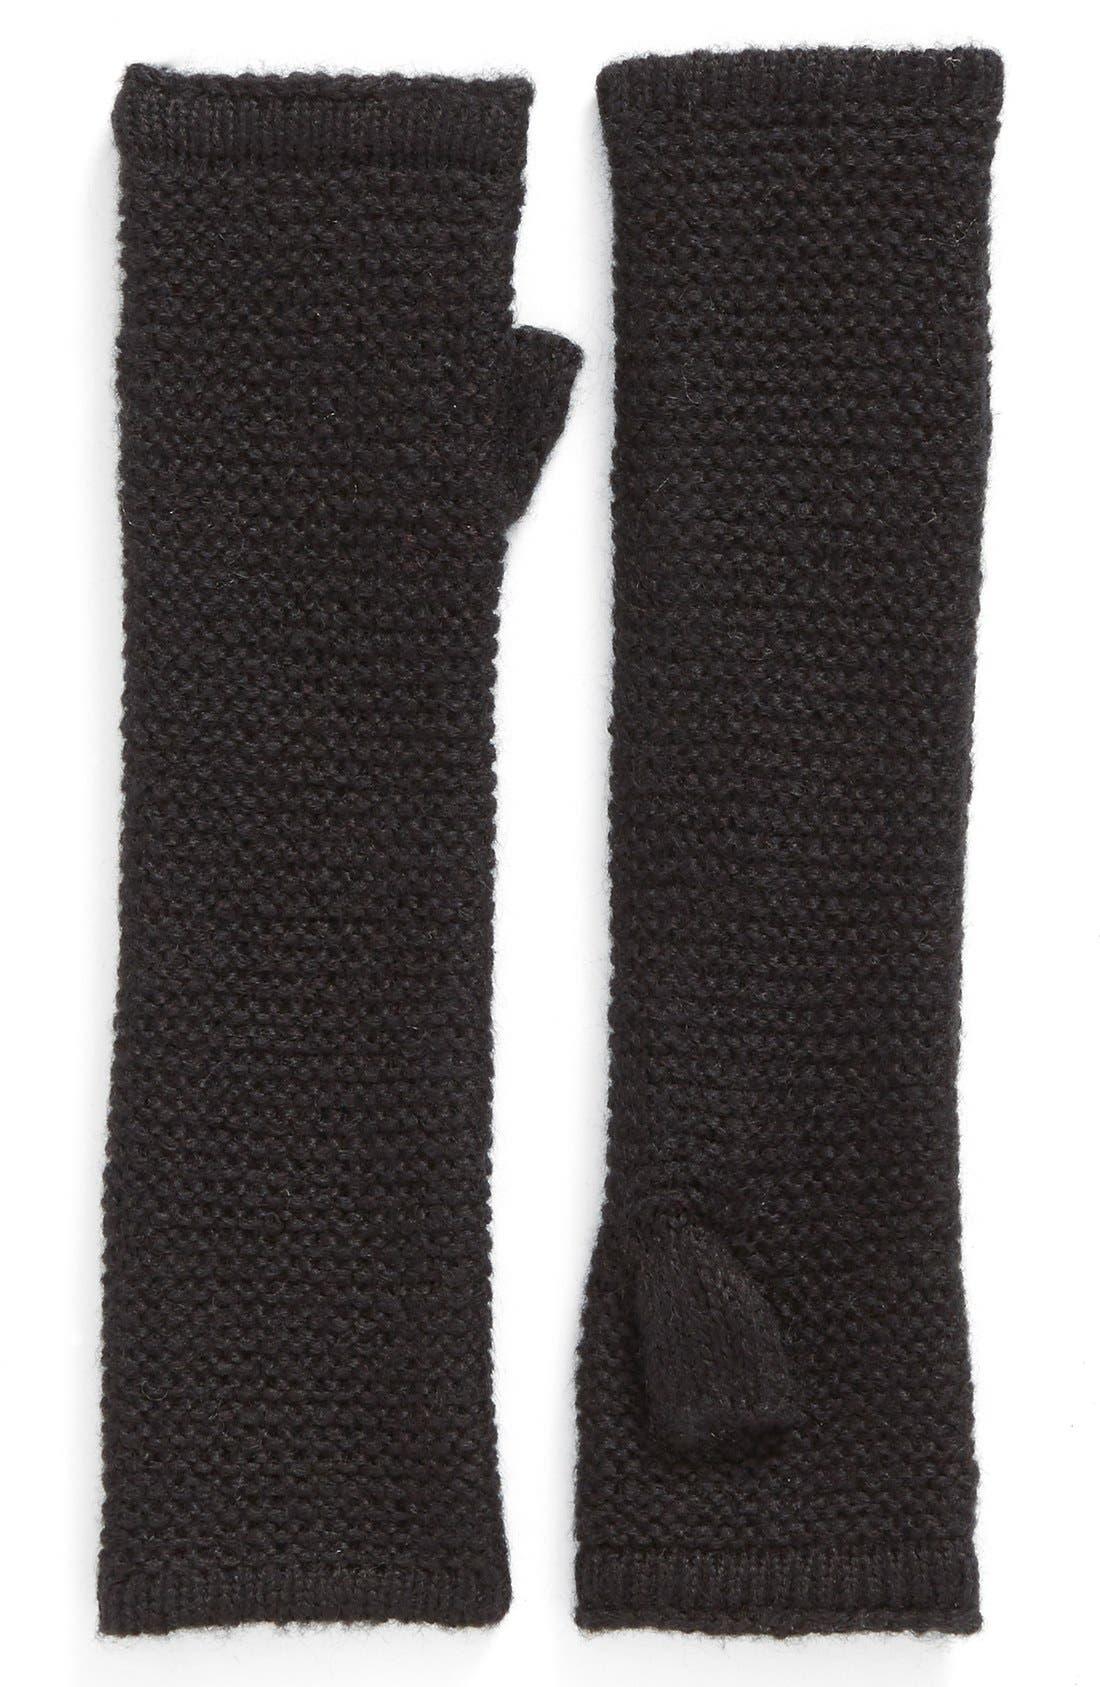 Garter Stitch Fingerless Gloves,                             Main thumbnail 4, color,